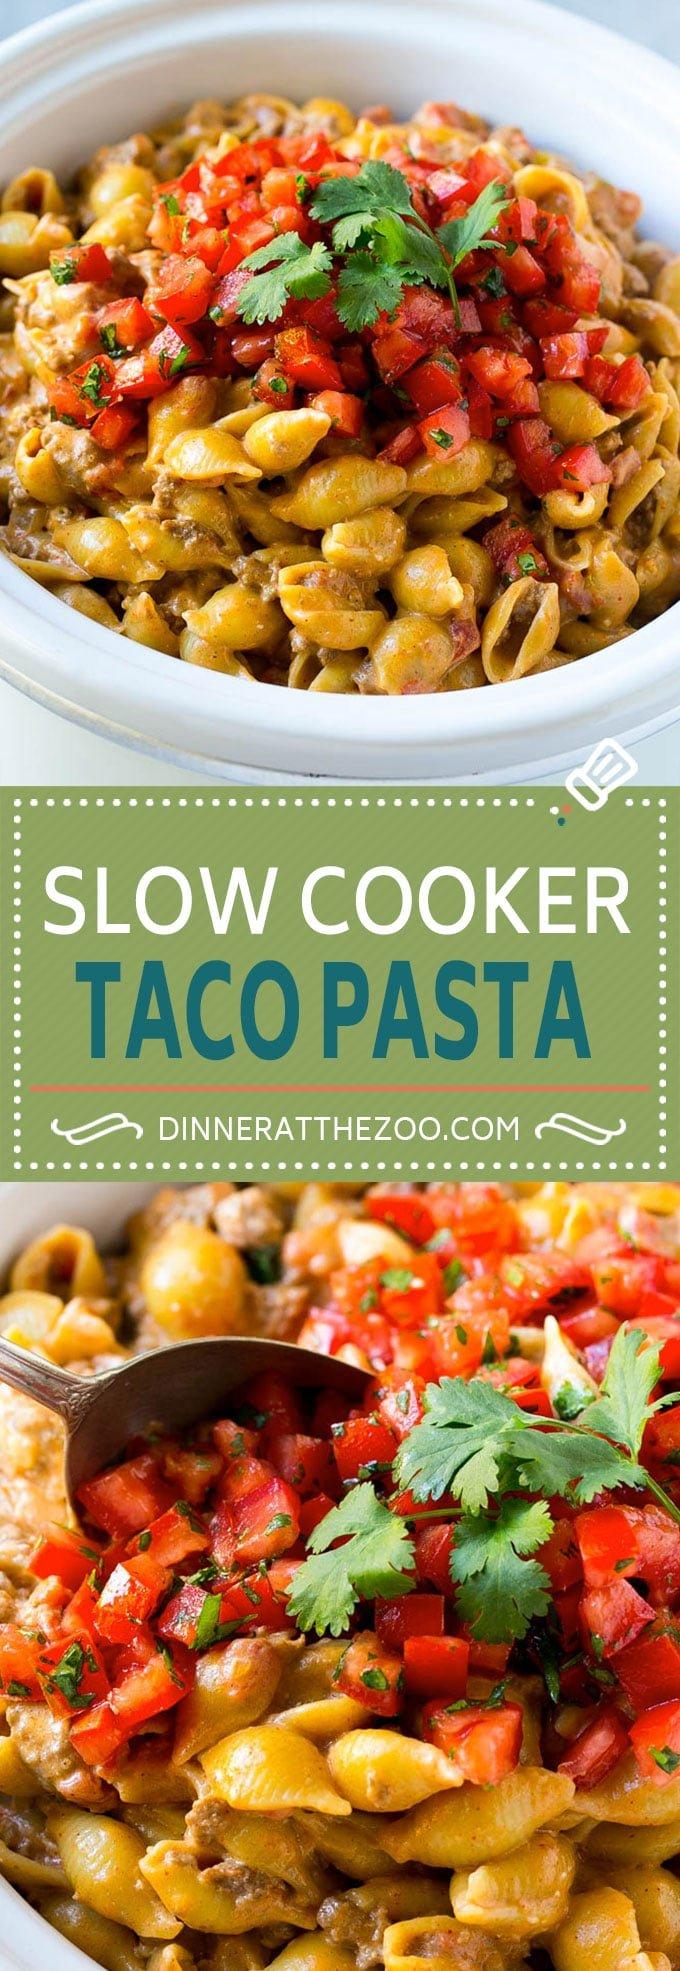 Slow Cooker Taco Pasta | Taco Pasta | Slow Cooker Pasta #pasta #slowcooker #crockpot #dinner #dinneratthezoo